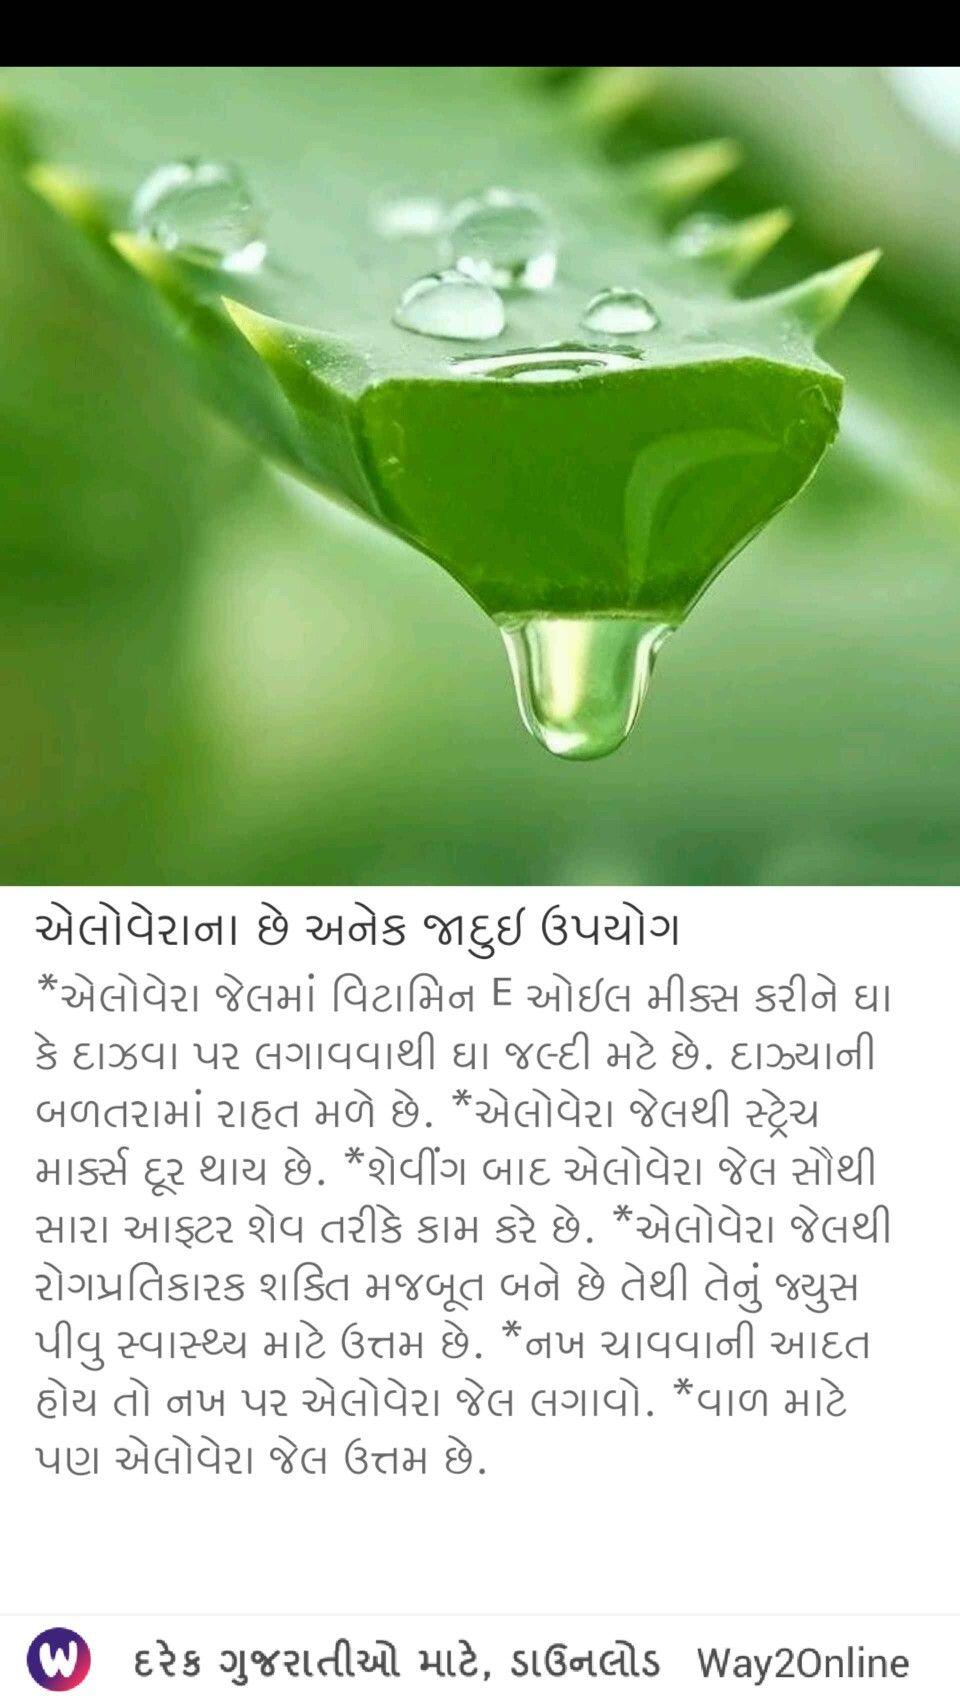 Pin by Savseta Chirag on education Herbs, Education